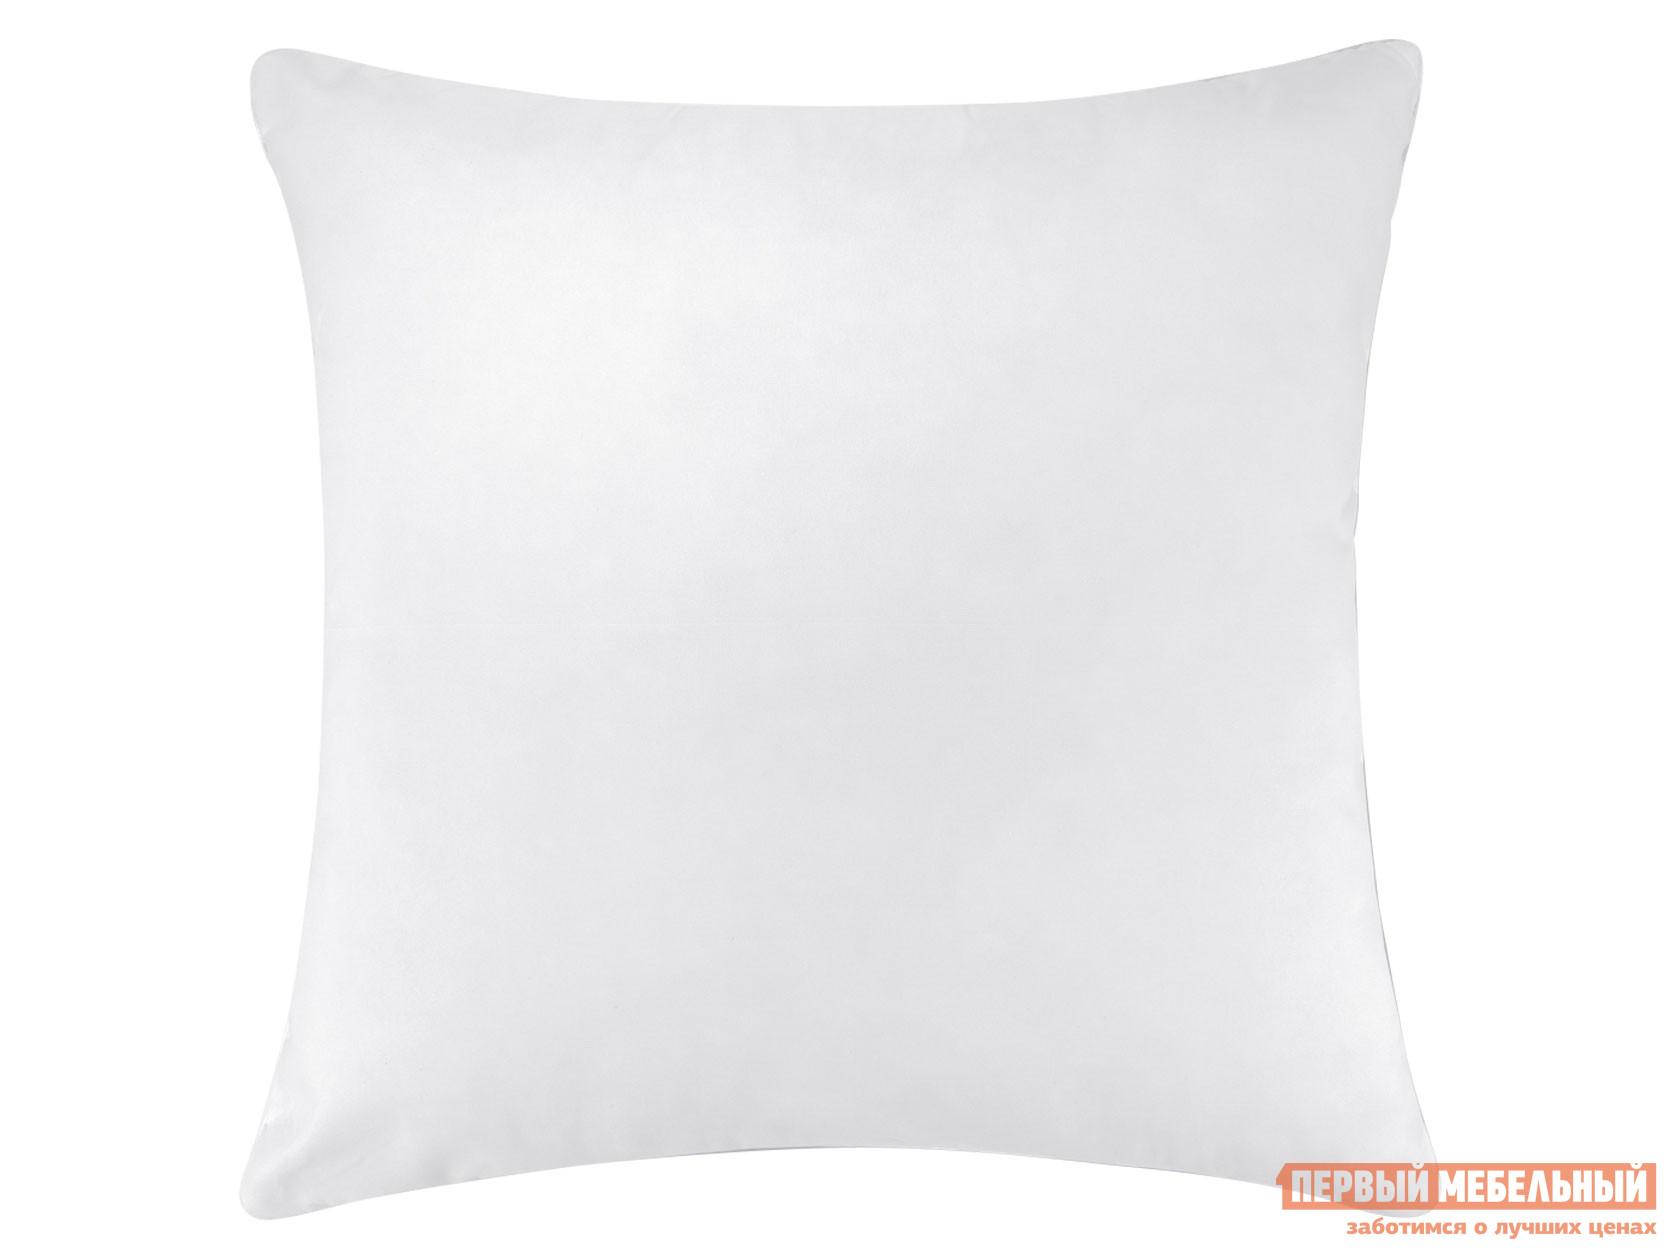 Подушка  Комфорт Файбер Белый, 68 Х 68 см